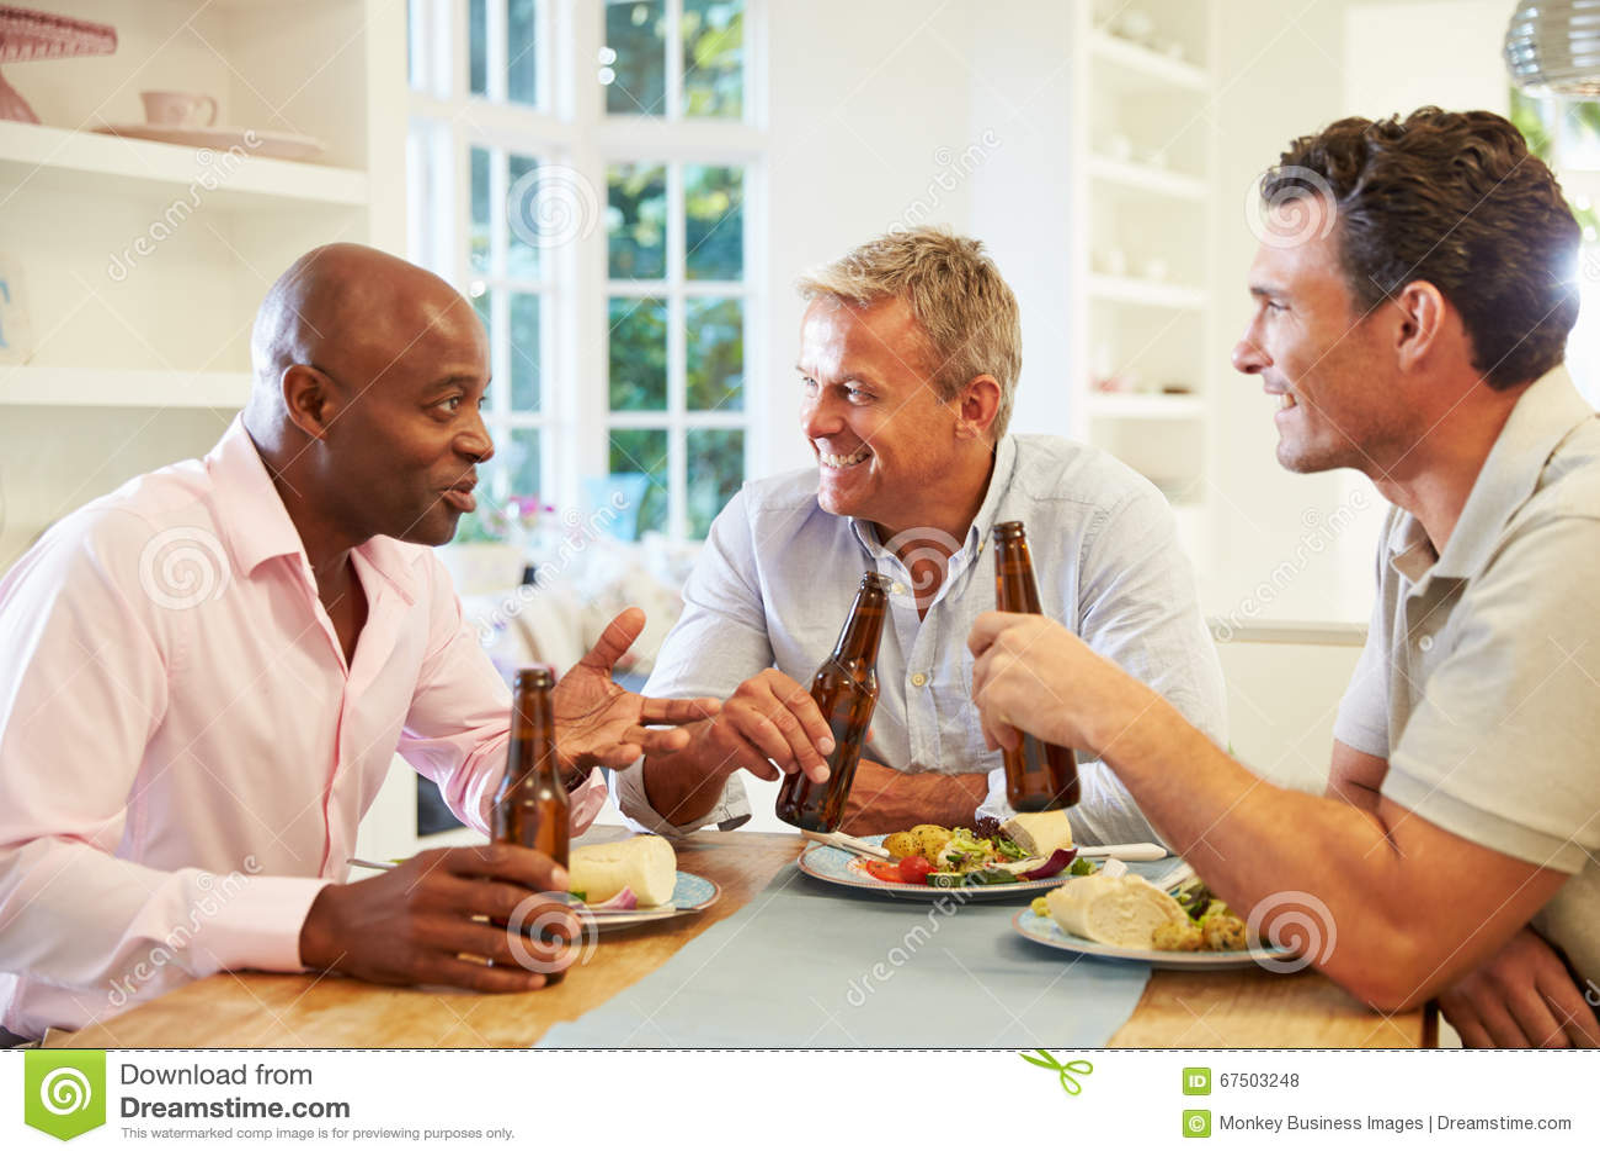 Amici maschii maturi Sit At Table Drinking Beer e mangiare